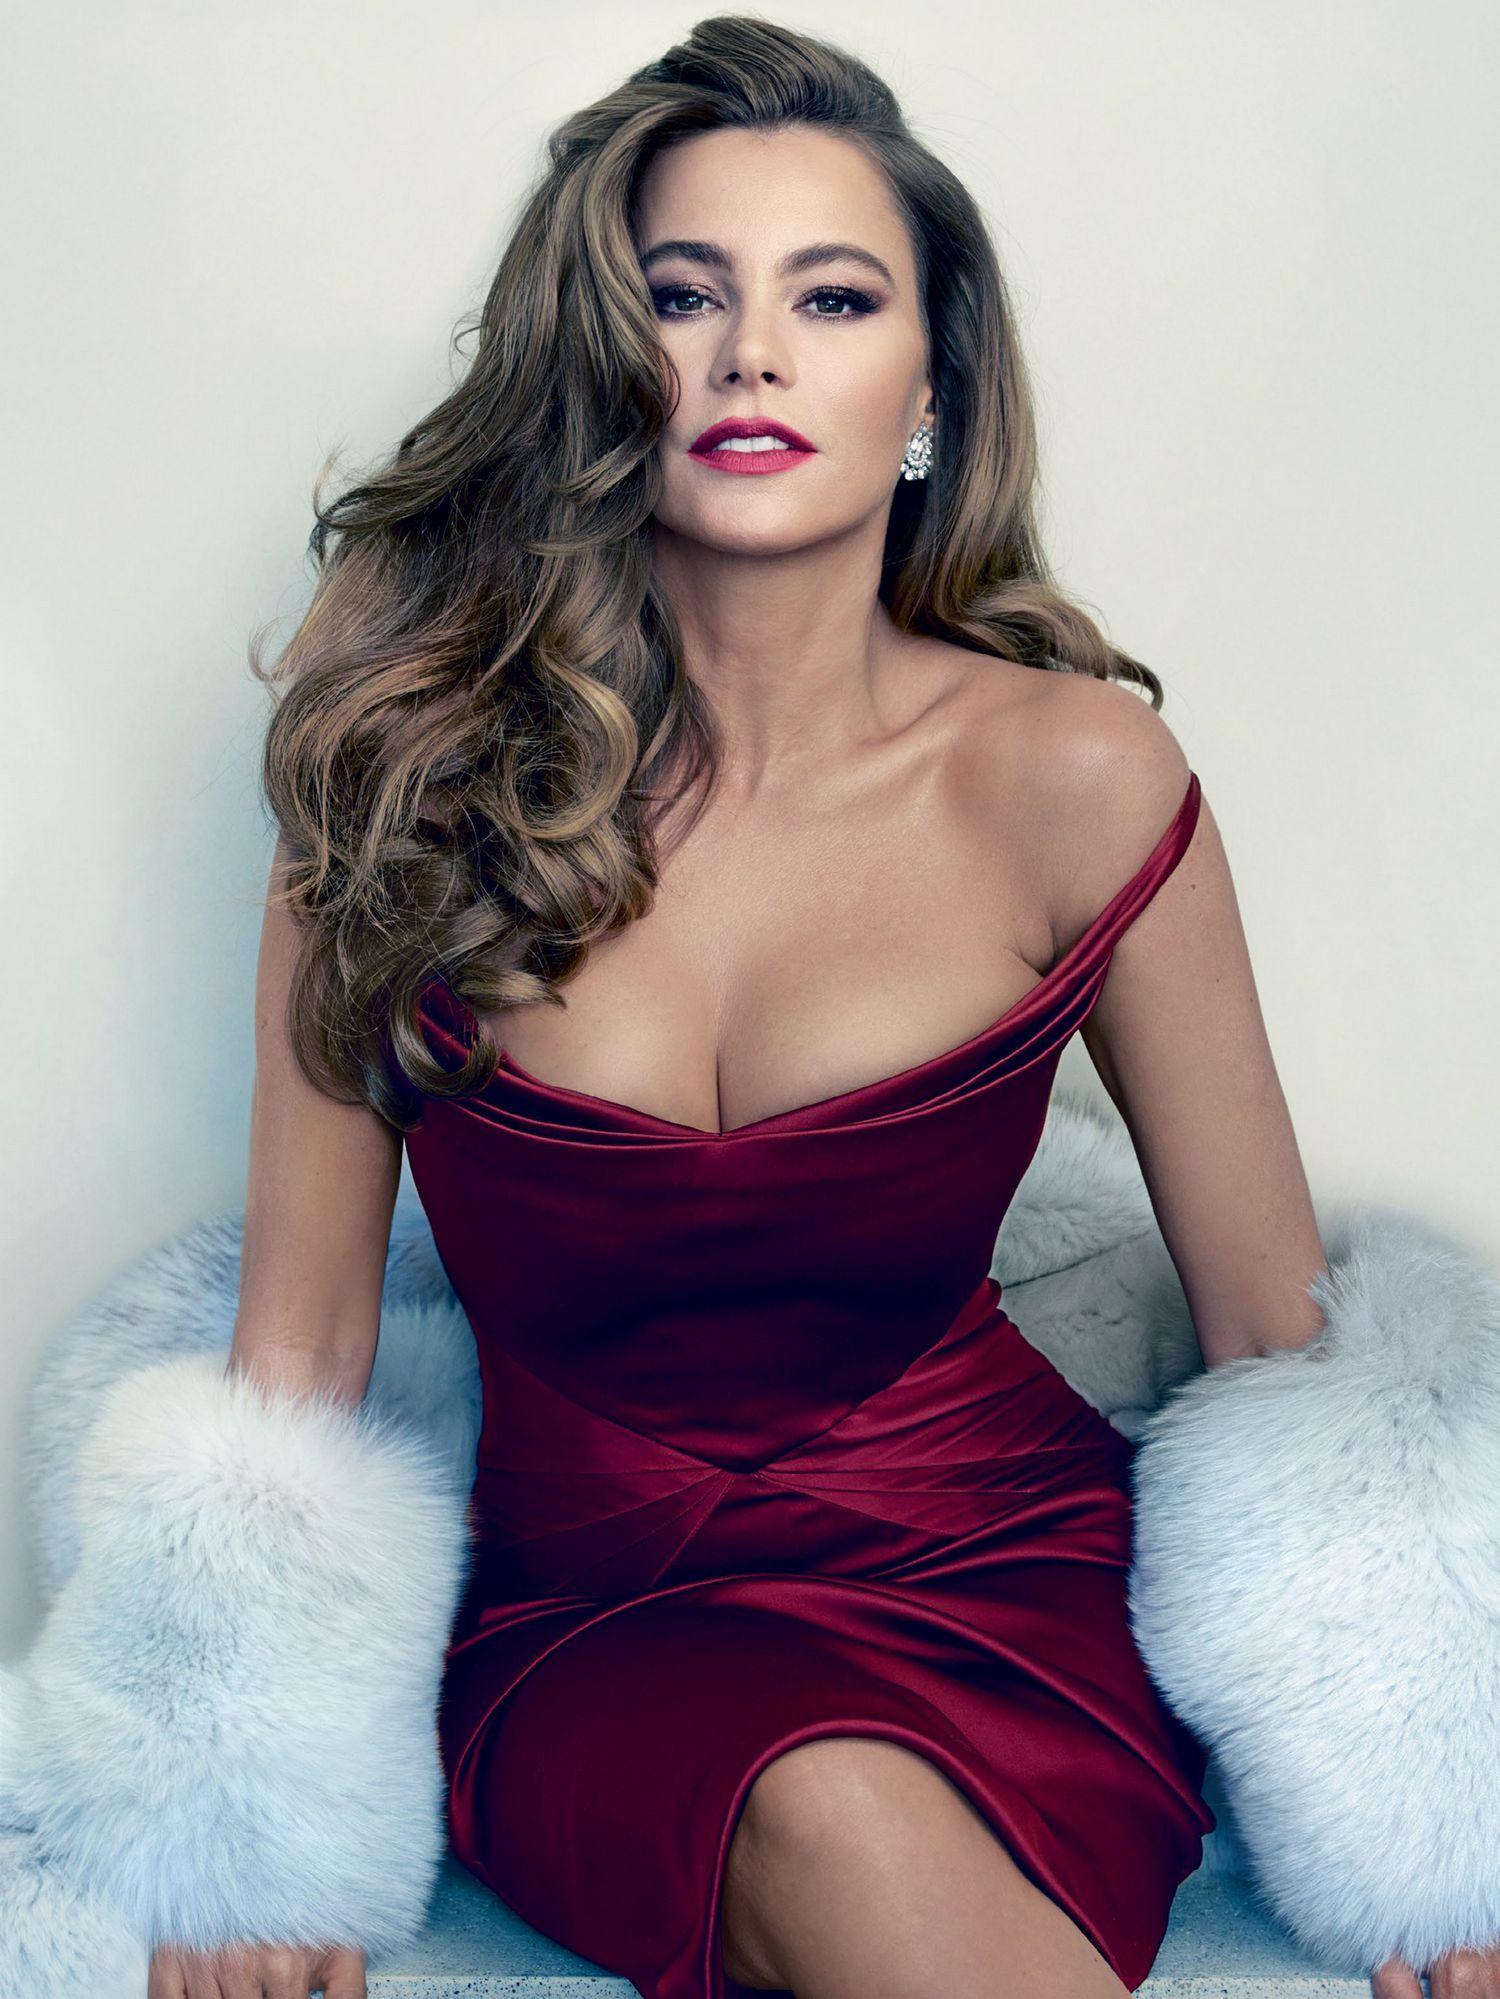 16 Hottest GIFs of 'Modern Family' Star Sofia Vergara | Sofia ...